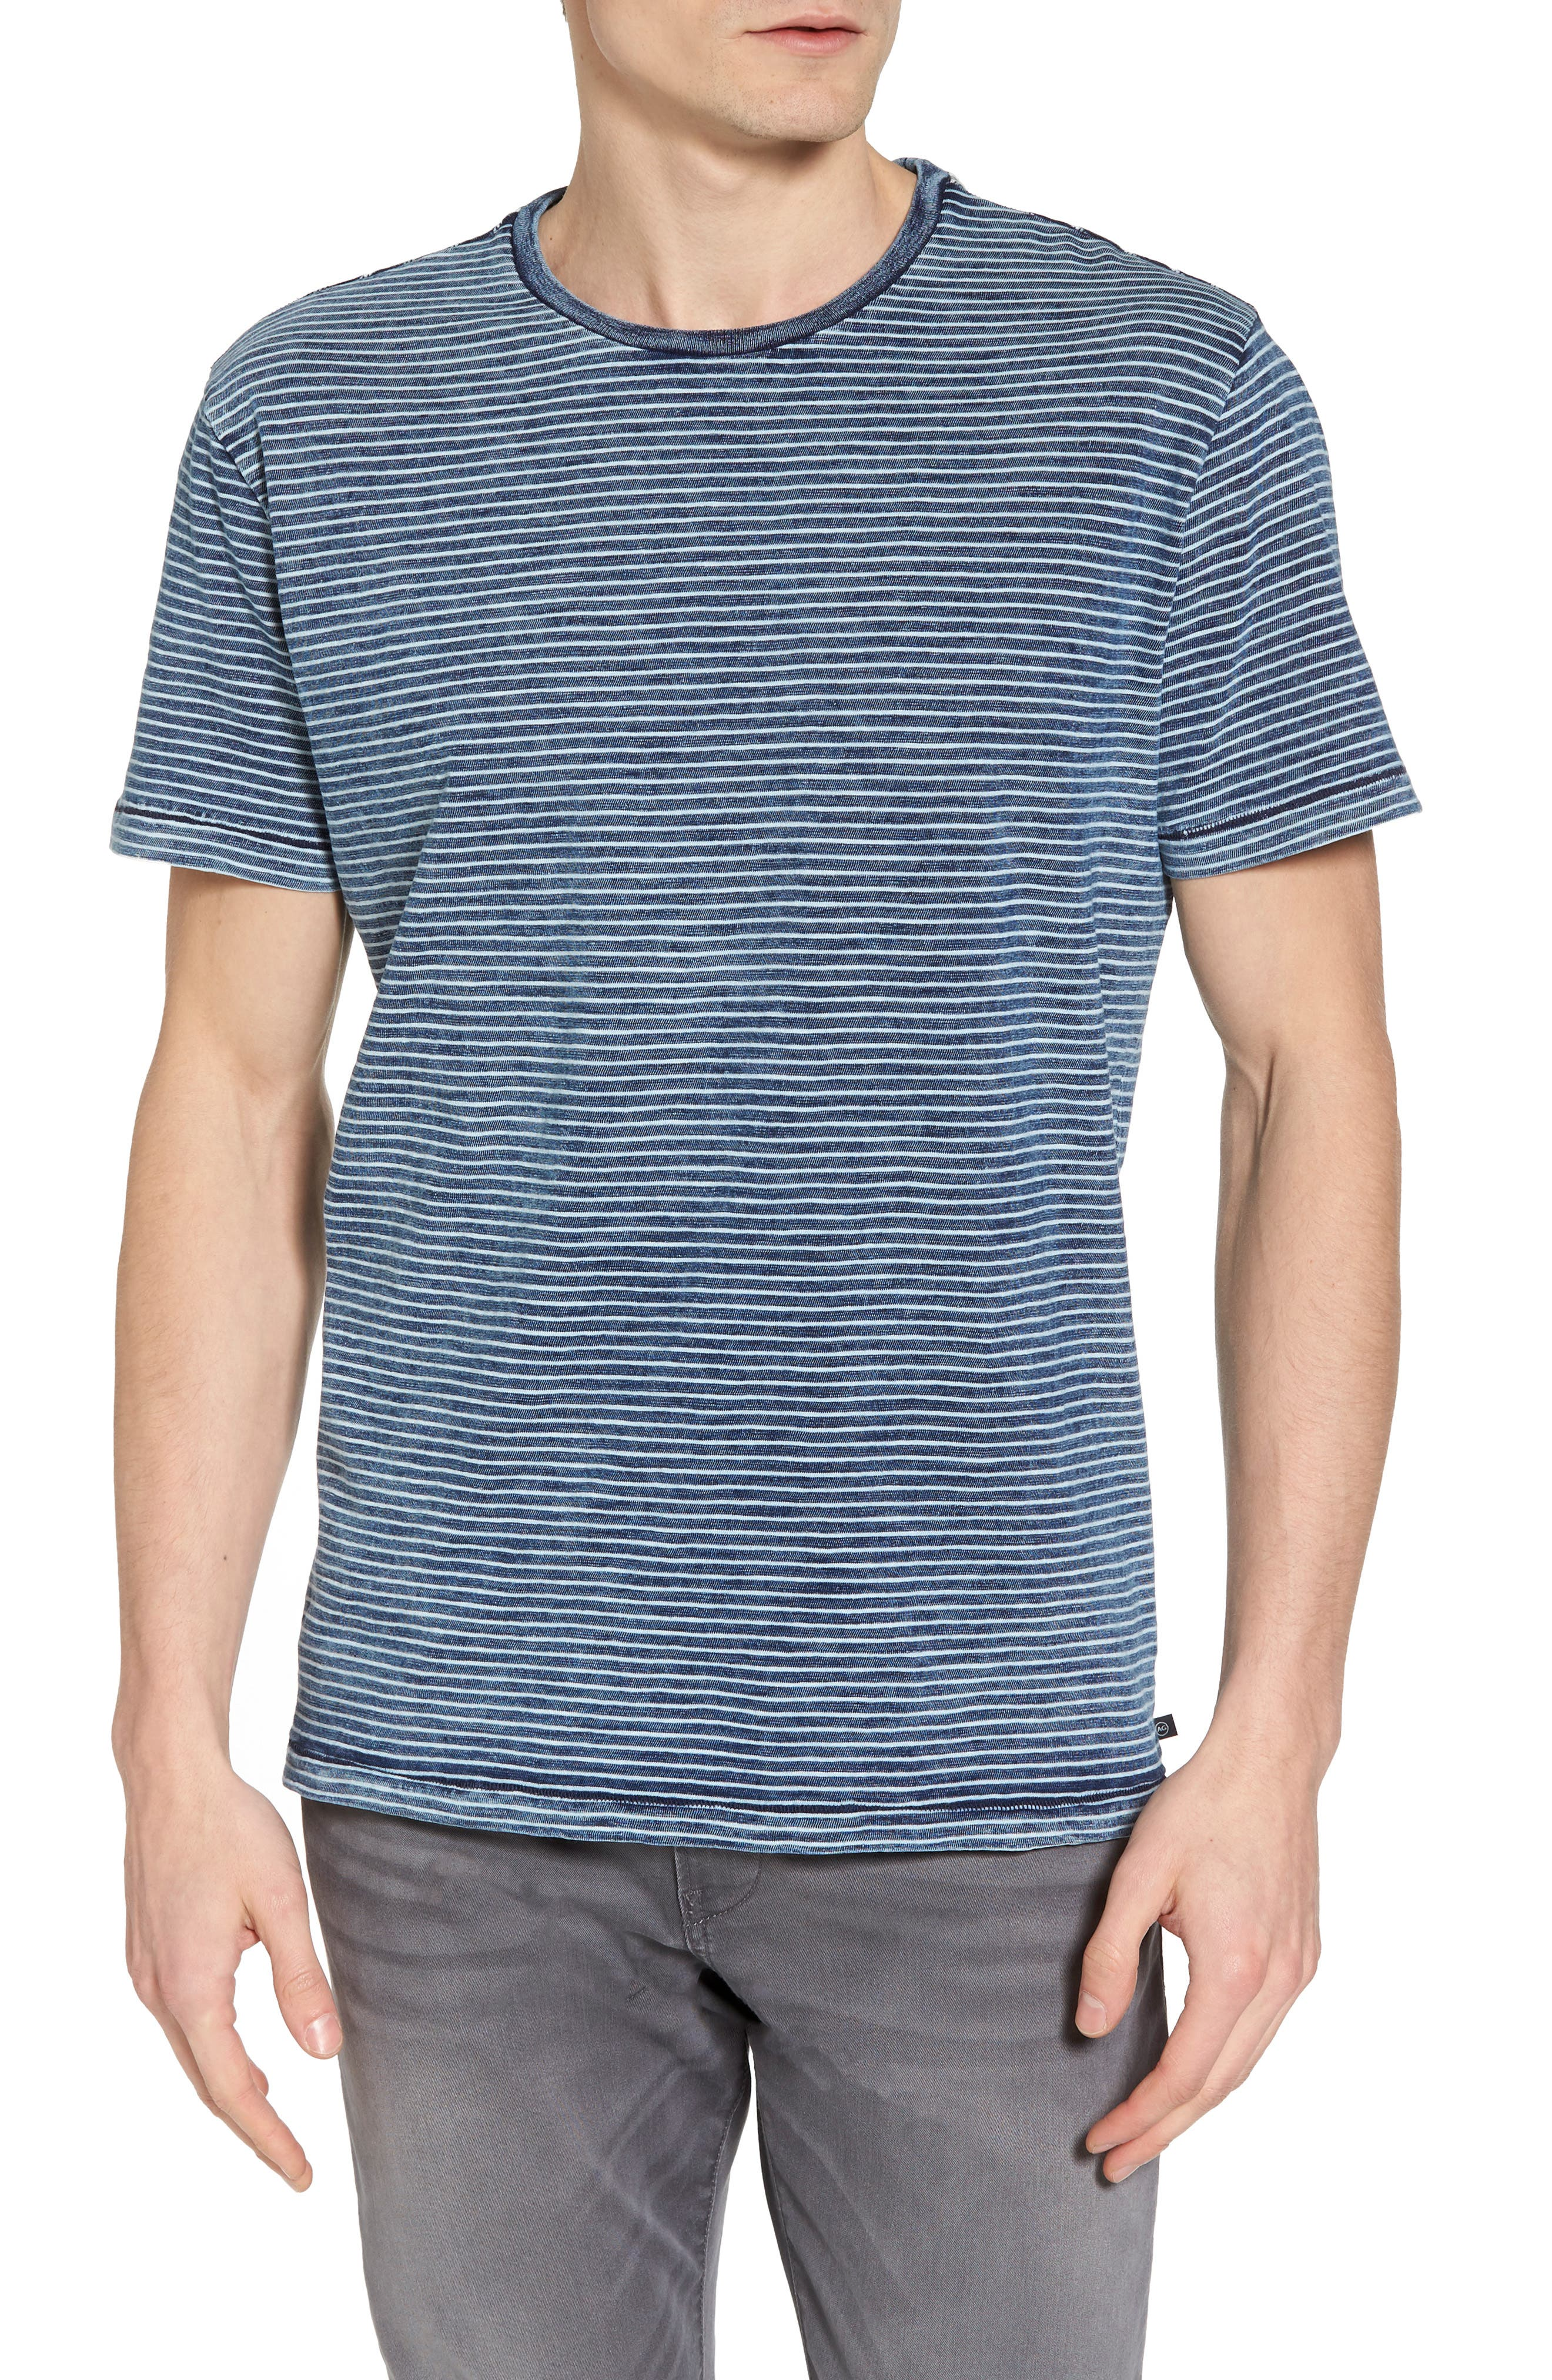 Julian Slim Fit Crewneck Shirt,                             Main thumbnail 1, color,                             Marbled Indigo/ White Stripe